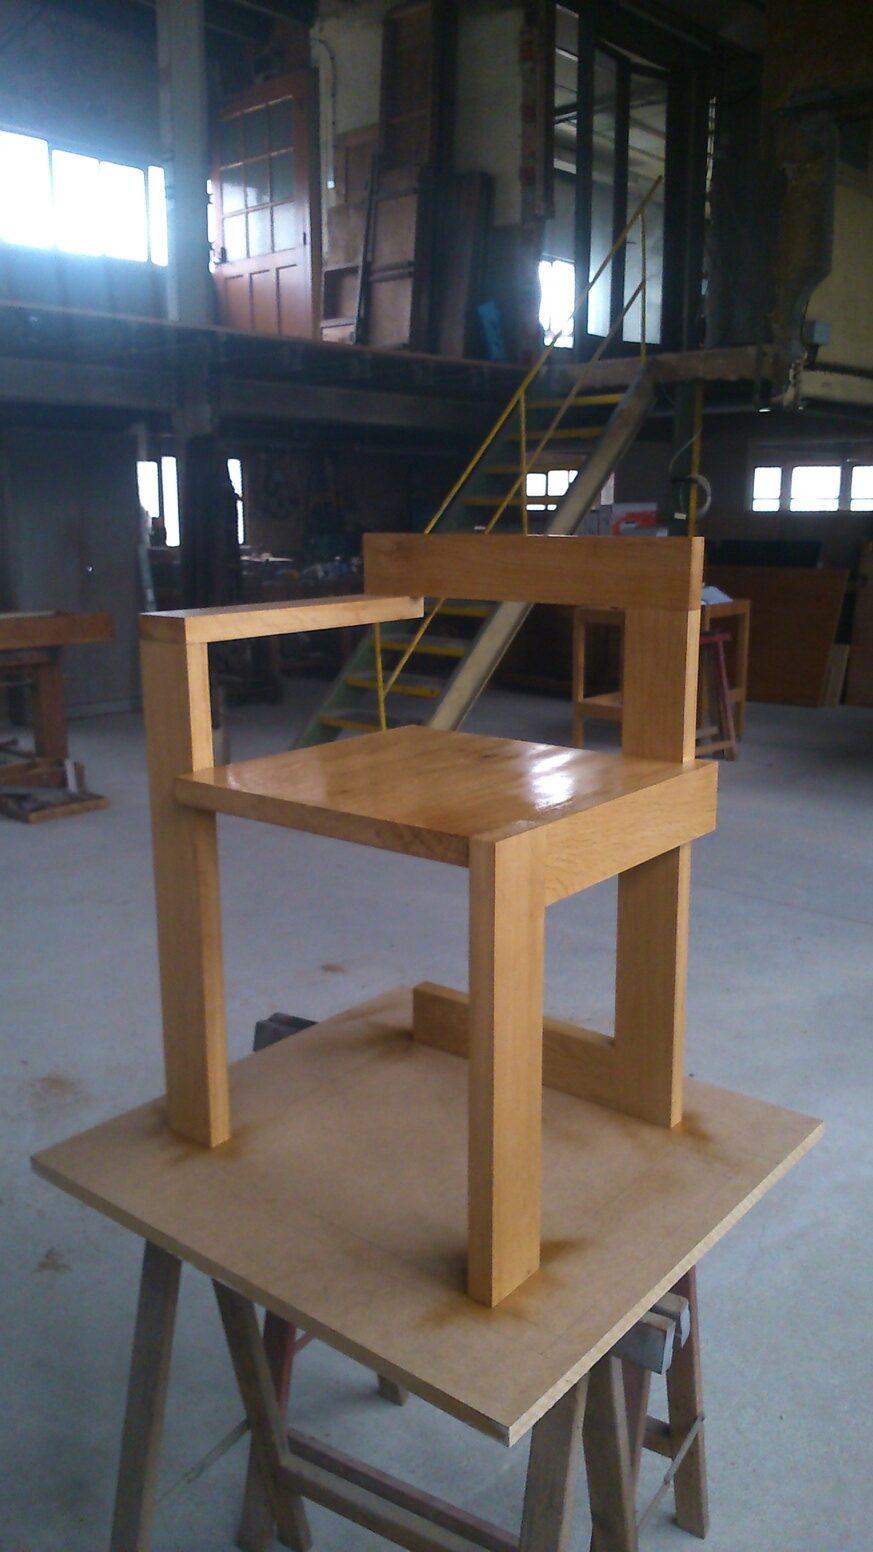 Chaise design atelier d 39 b nisterie angoul me for Mesure d une chaise